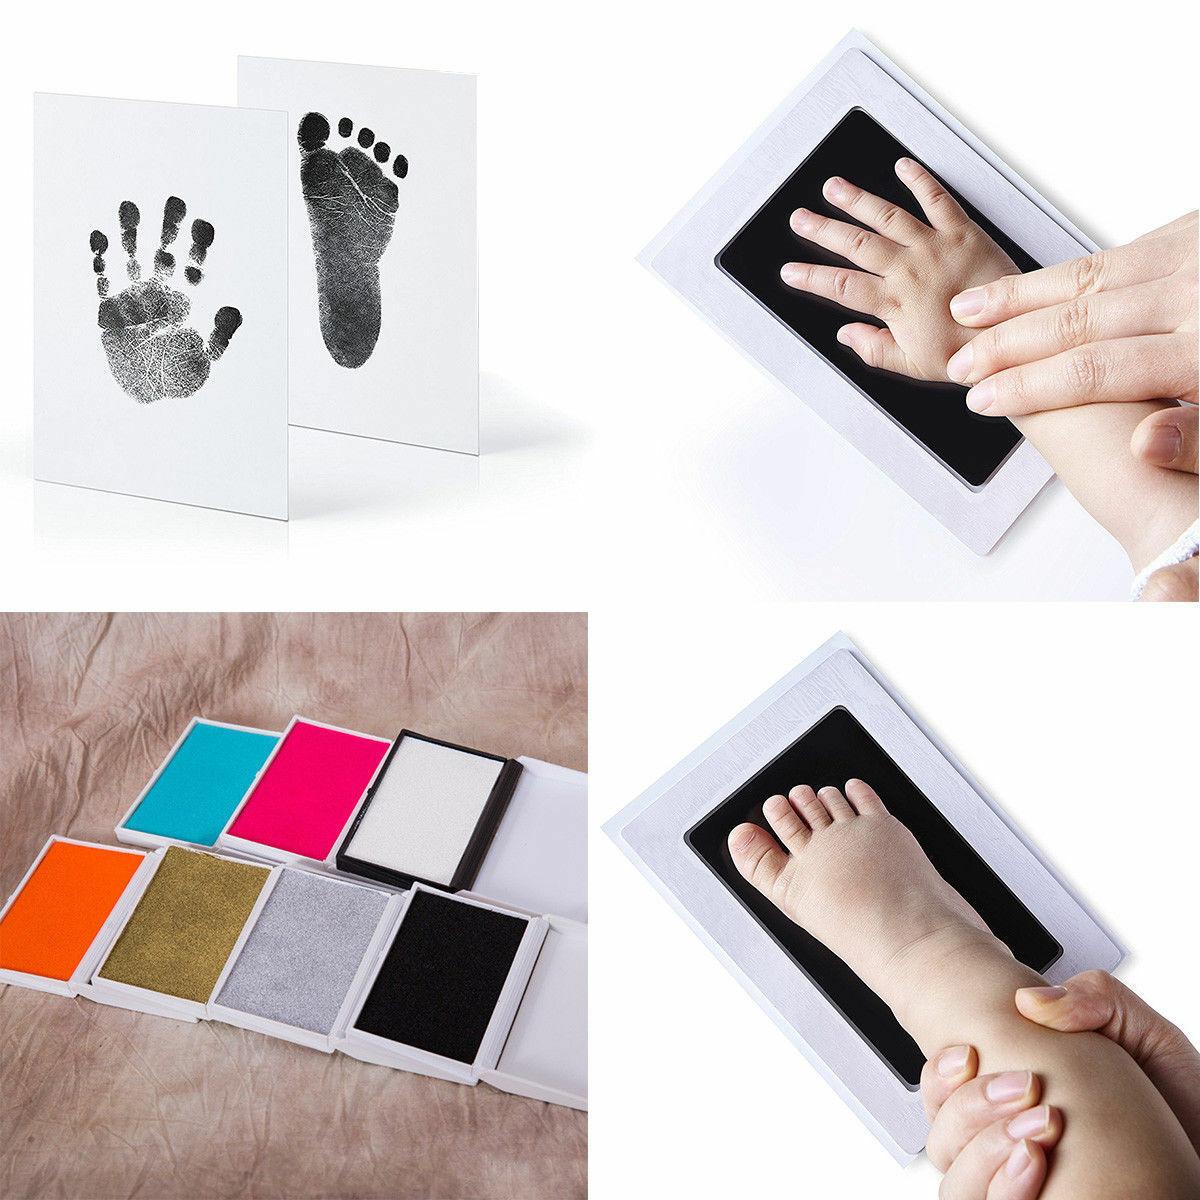 Imcute  New Baby Fashion Baby Print Ink Pad Footprint Handprint Kit Keepsake Maker Memories DIY Kid Gift